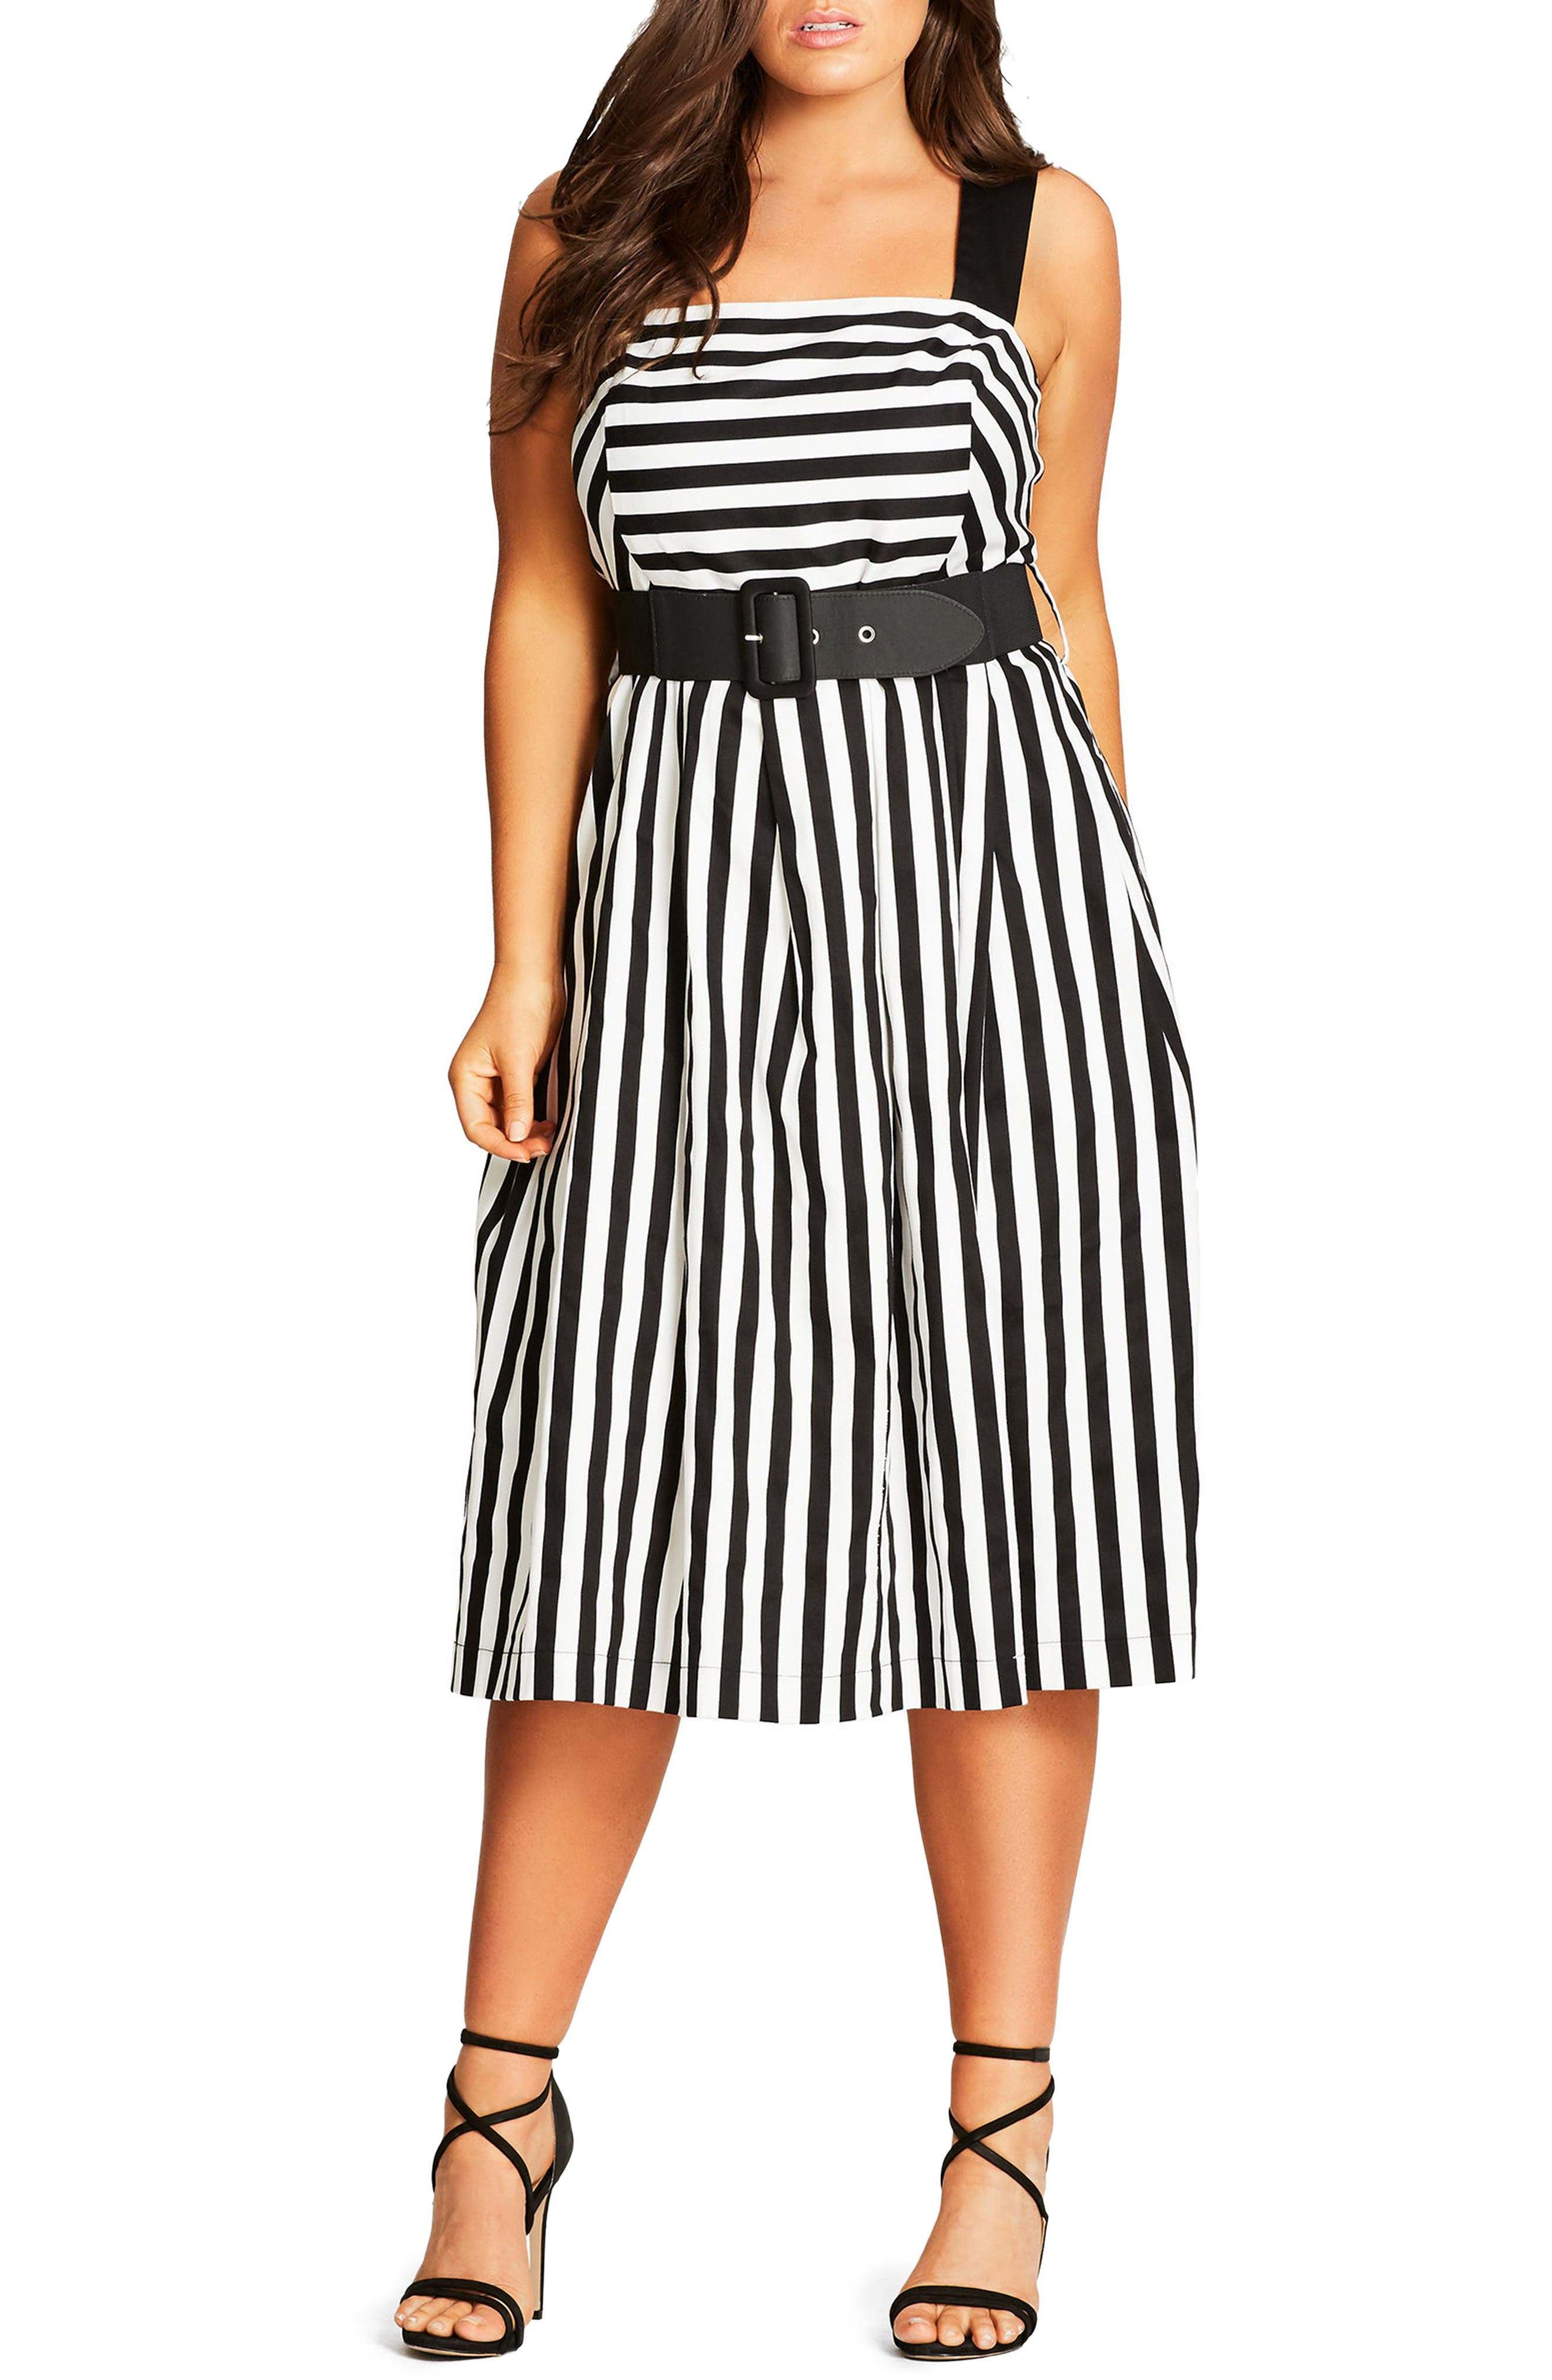 Alternate Image 1 Selected - City Chic So Fab Stripe Sundress (Plus Size)